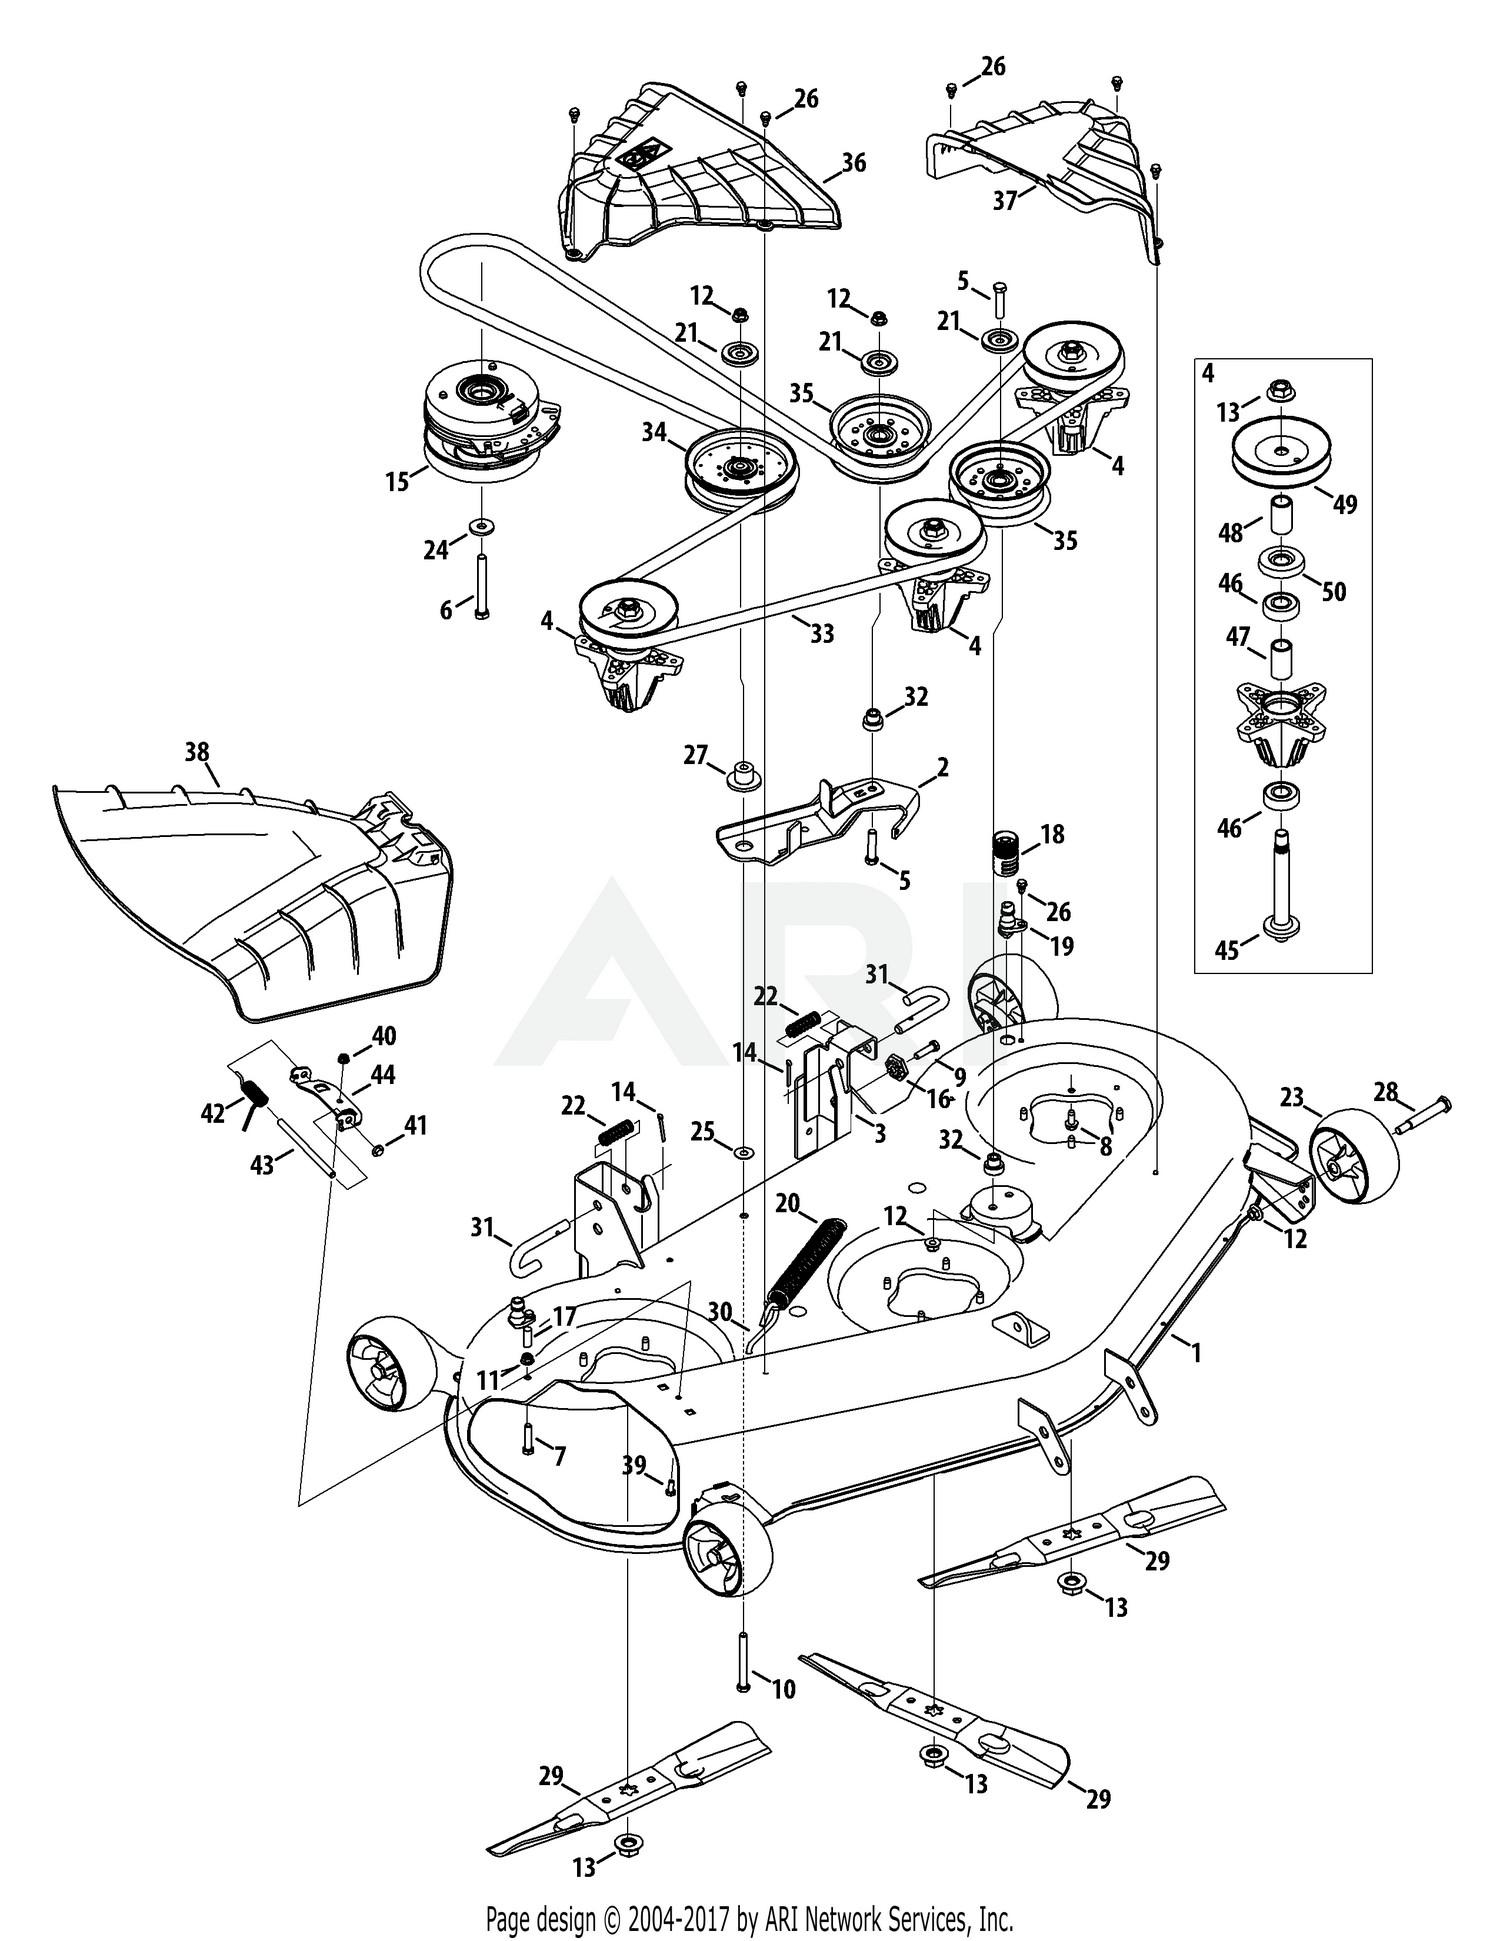 Troy Bilt Lawn Mower Engine Diagram Troy Bilt 17arcacq011 Mustang 50 Xp 2015 Mower Deck 50 Inch Of Troy Bilt Lawn Mower Engine Diagram